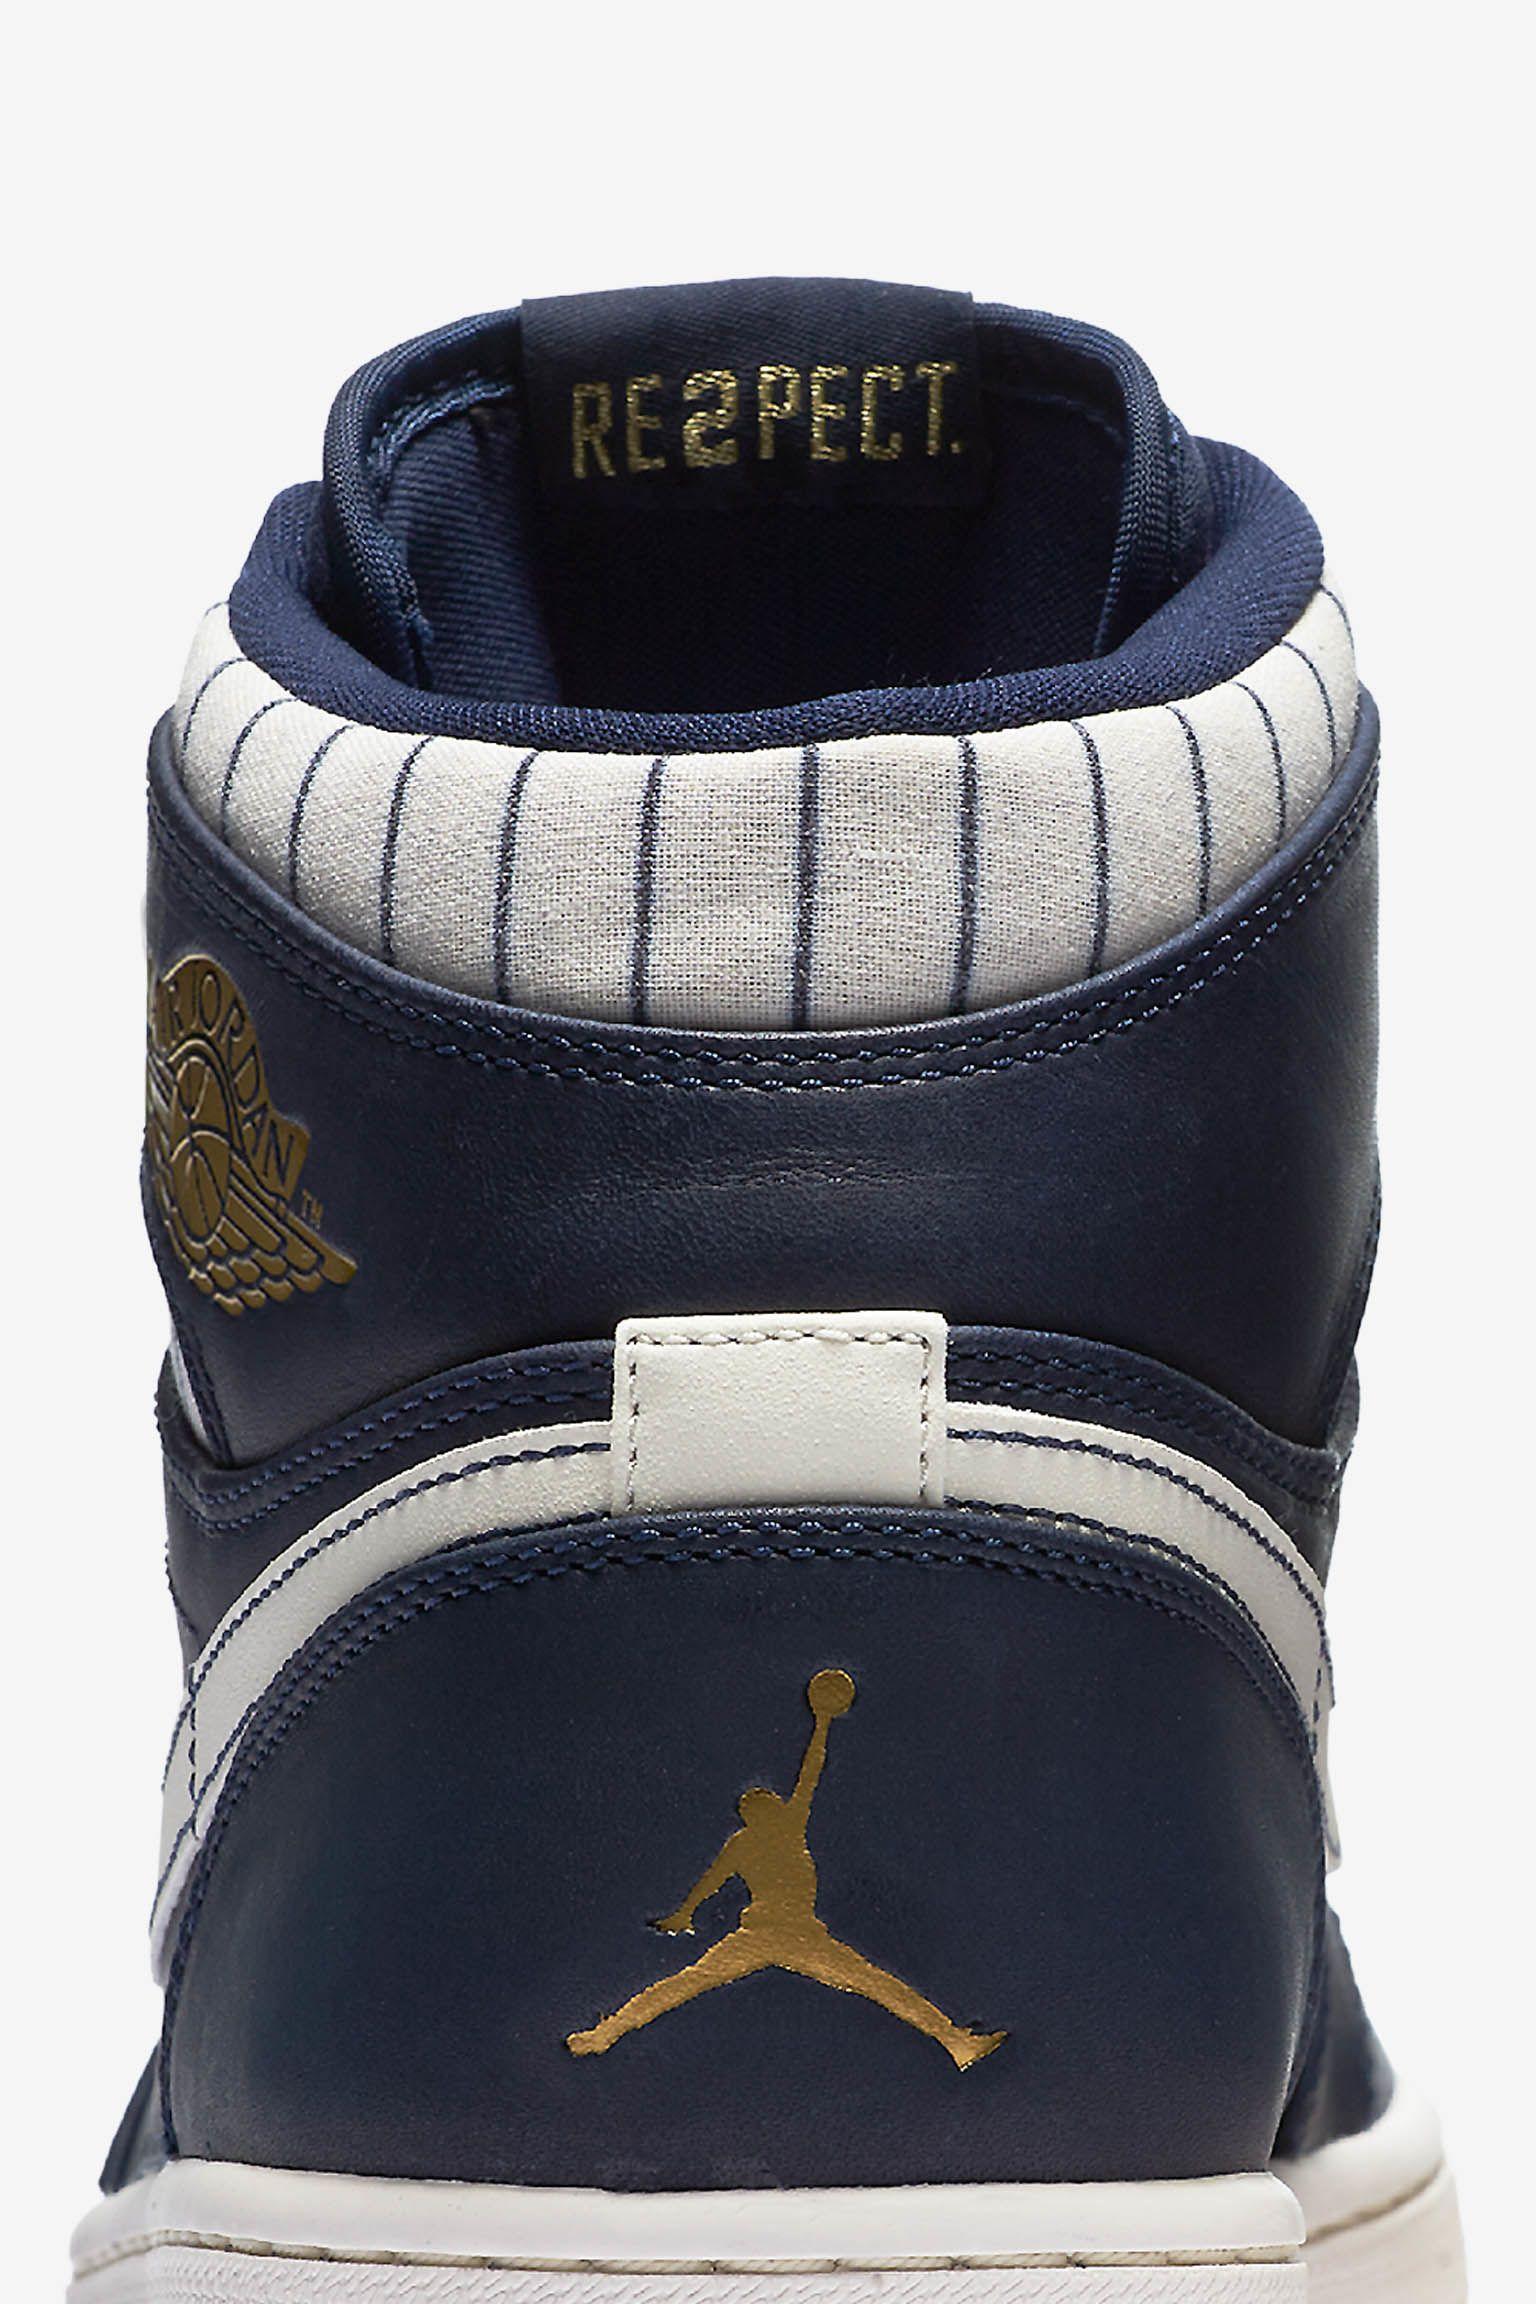 Air Jordan 1 Retro 'Jeter'